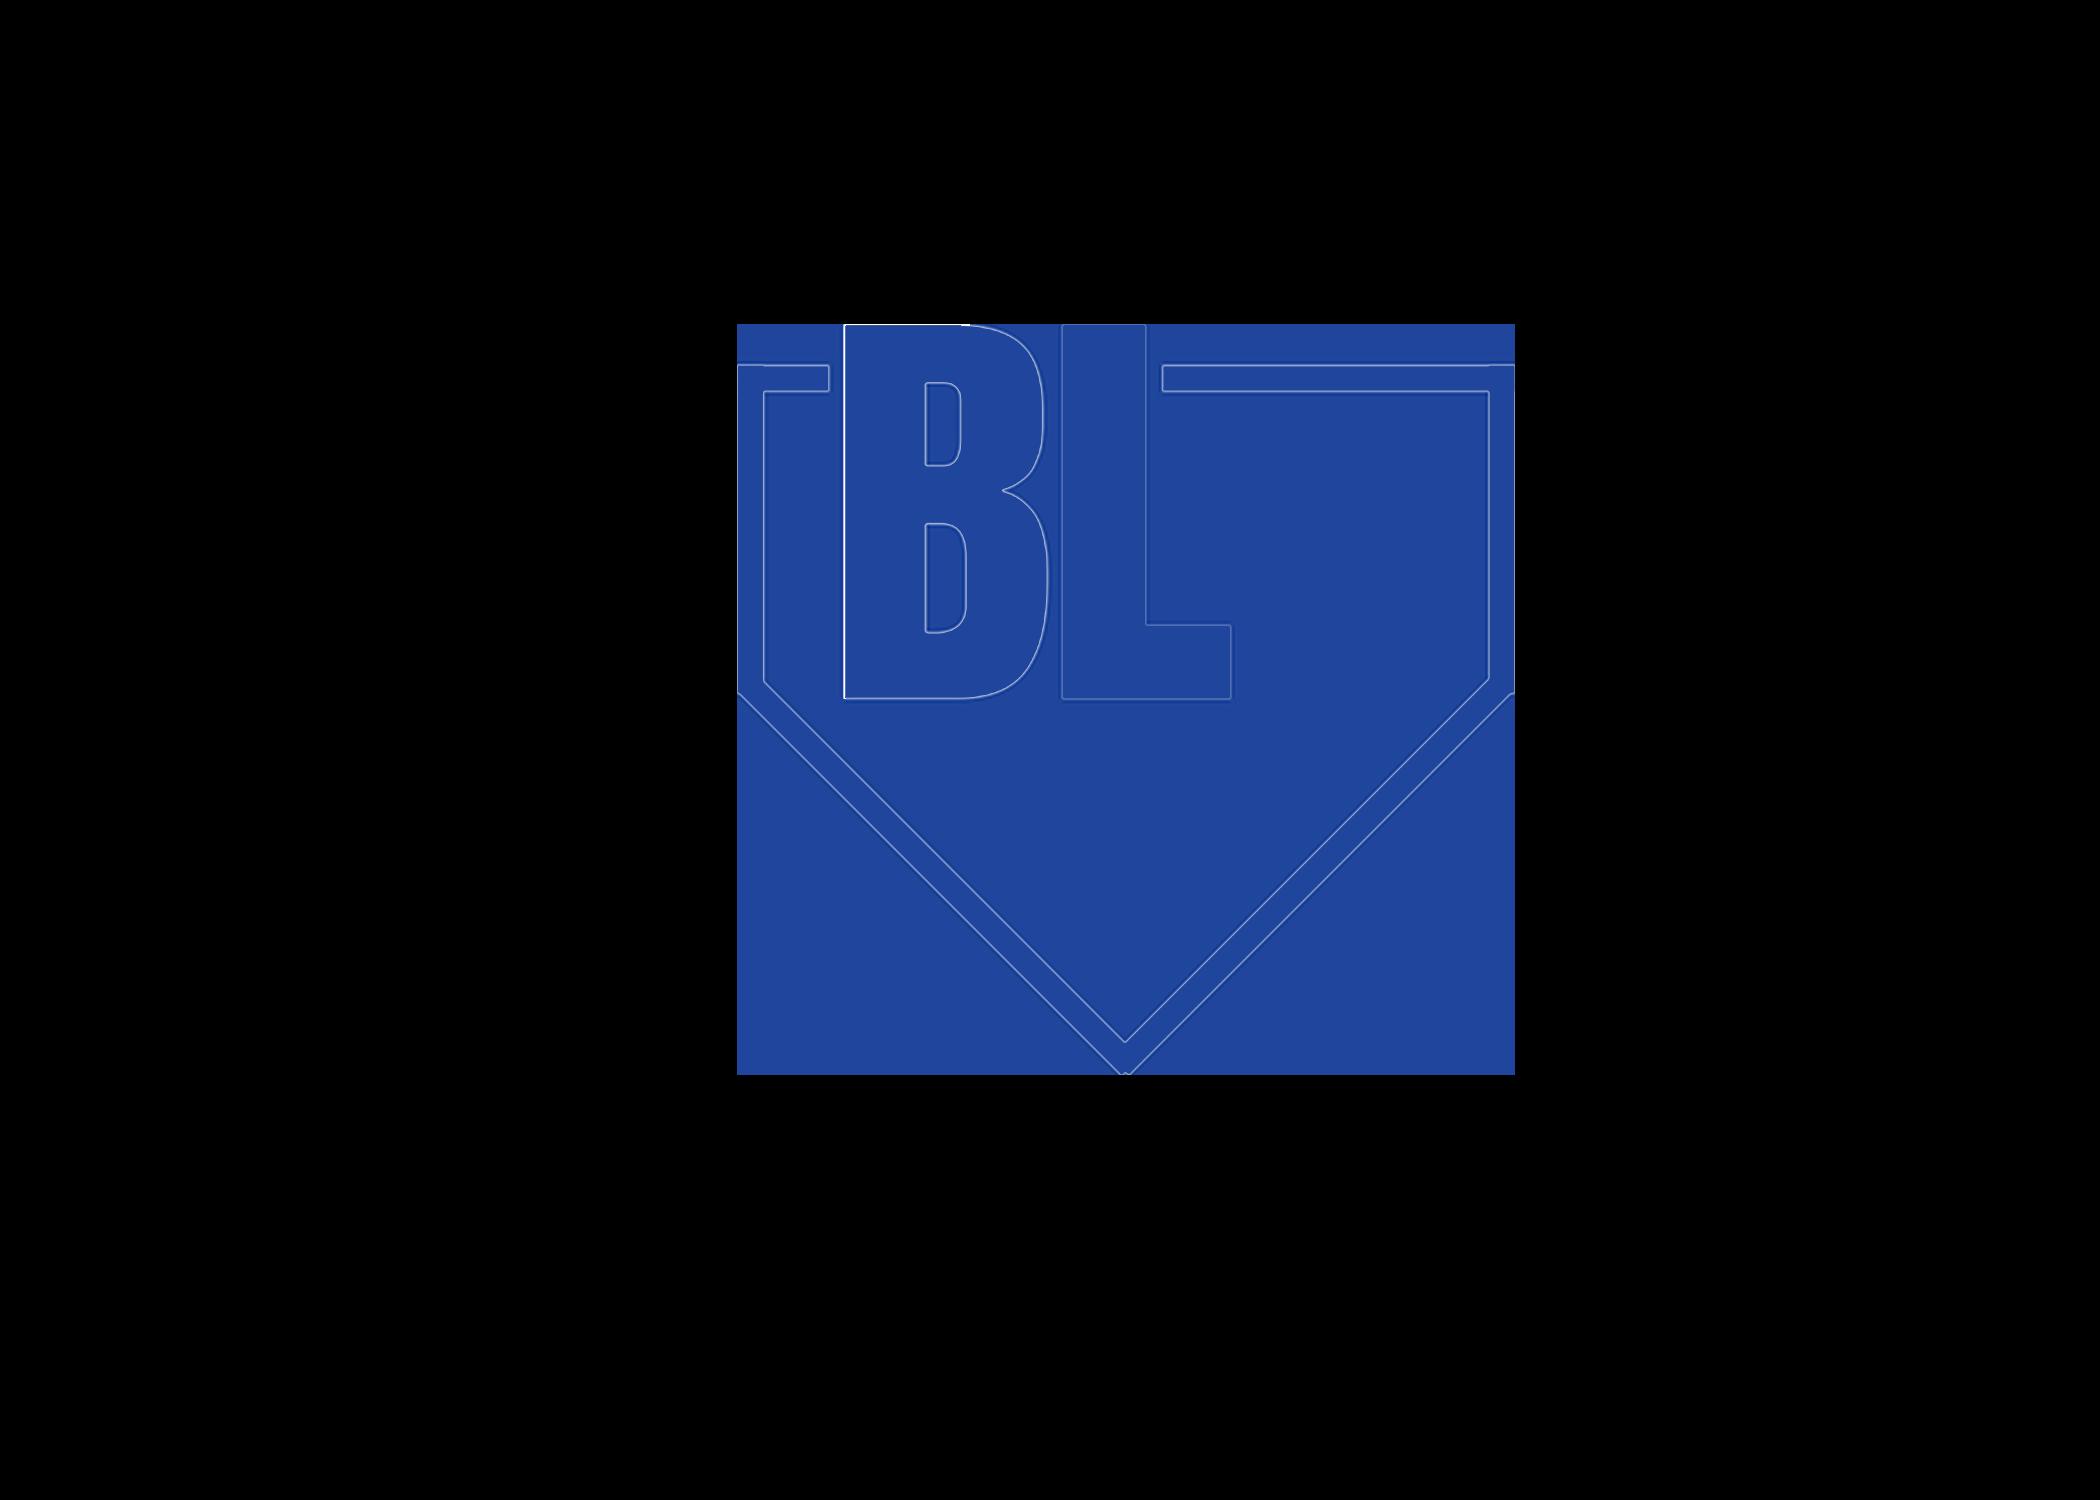 Bases Loaded Baseball & Softball Facility